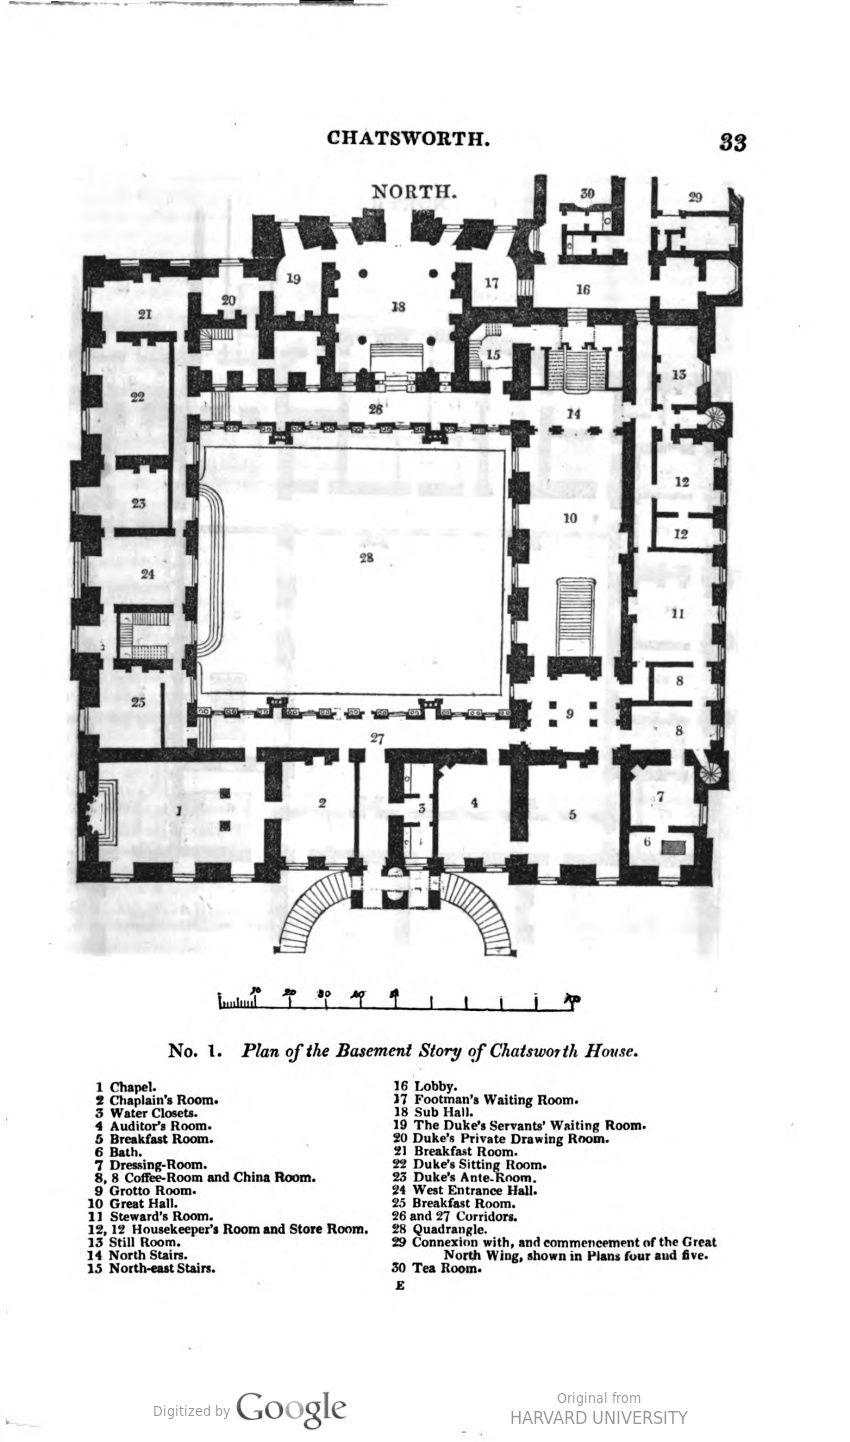 Chatsworth House Derbyshire Basement Floor Plan Basement Floor Plans Chatsworth House Floor Plans